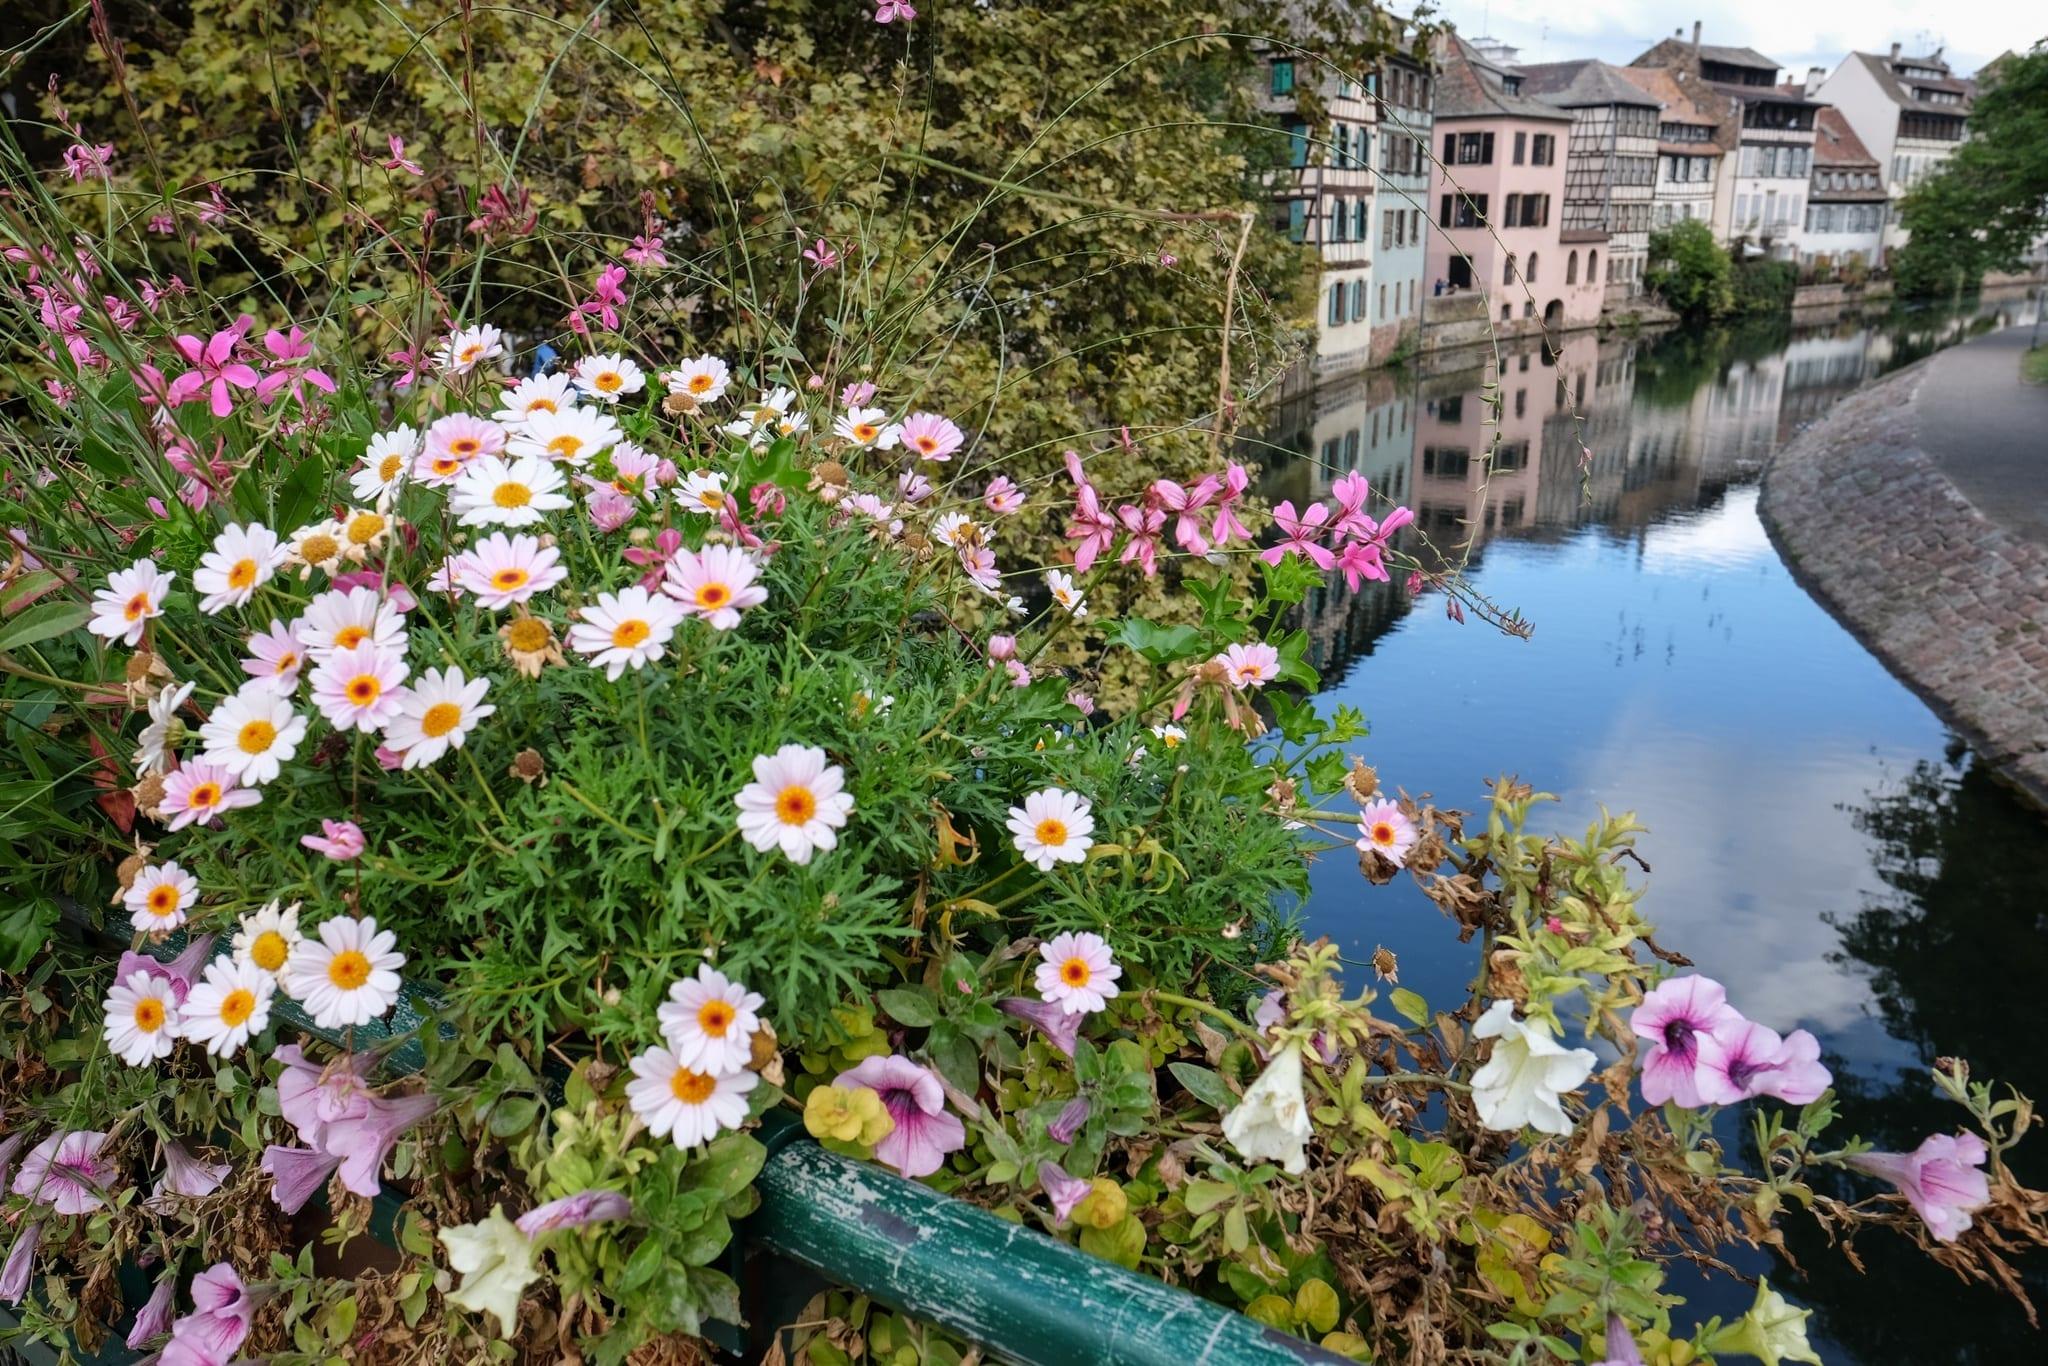 Flowers in Strasbourg